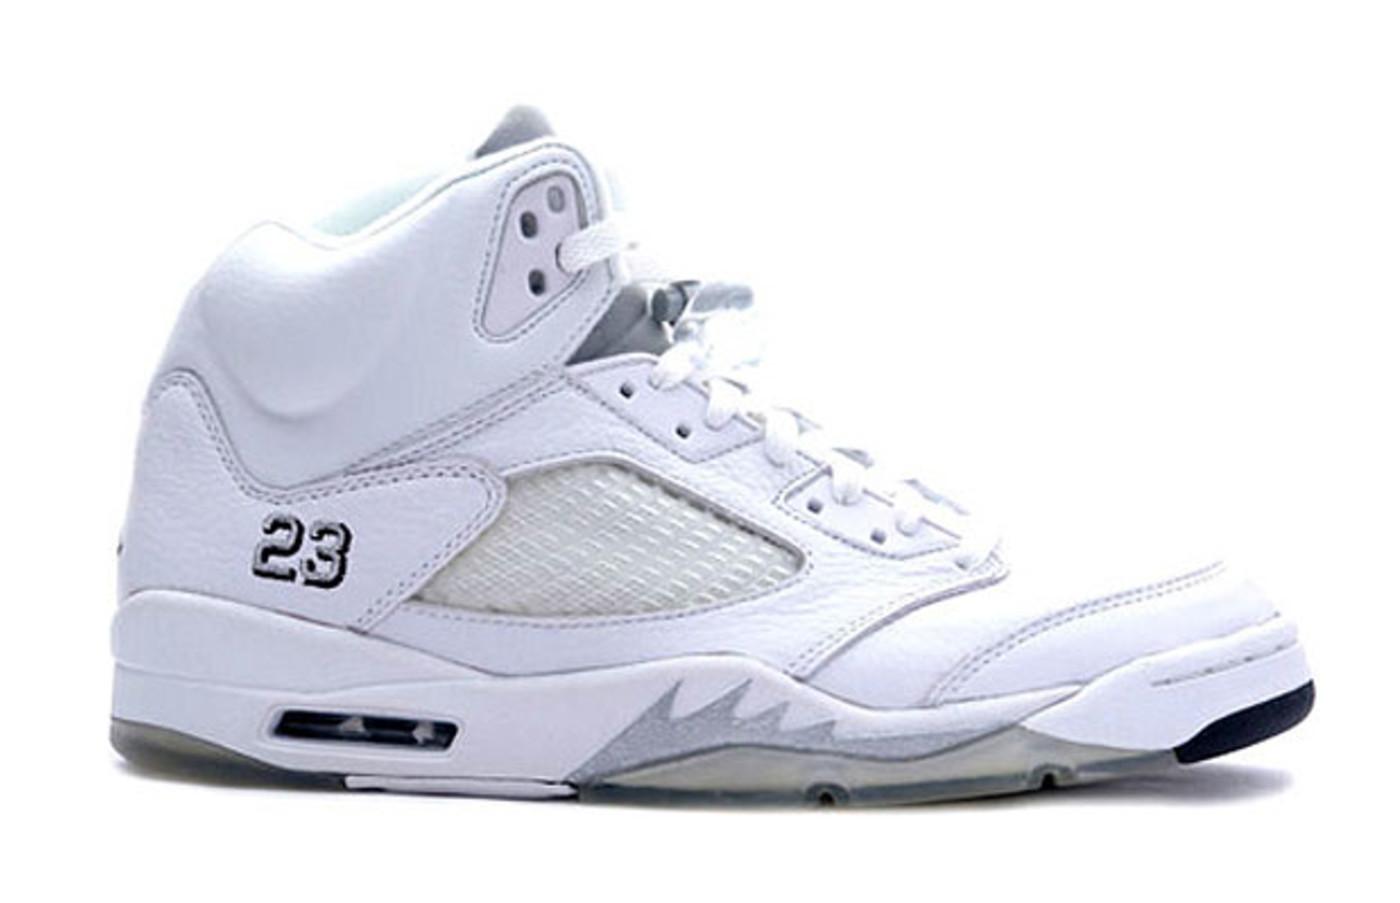 jordan 5 white and grey